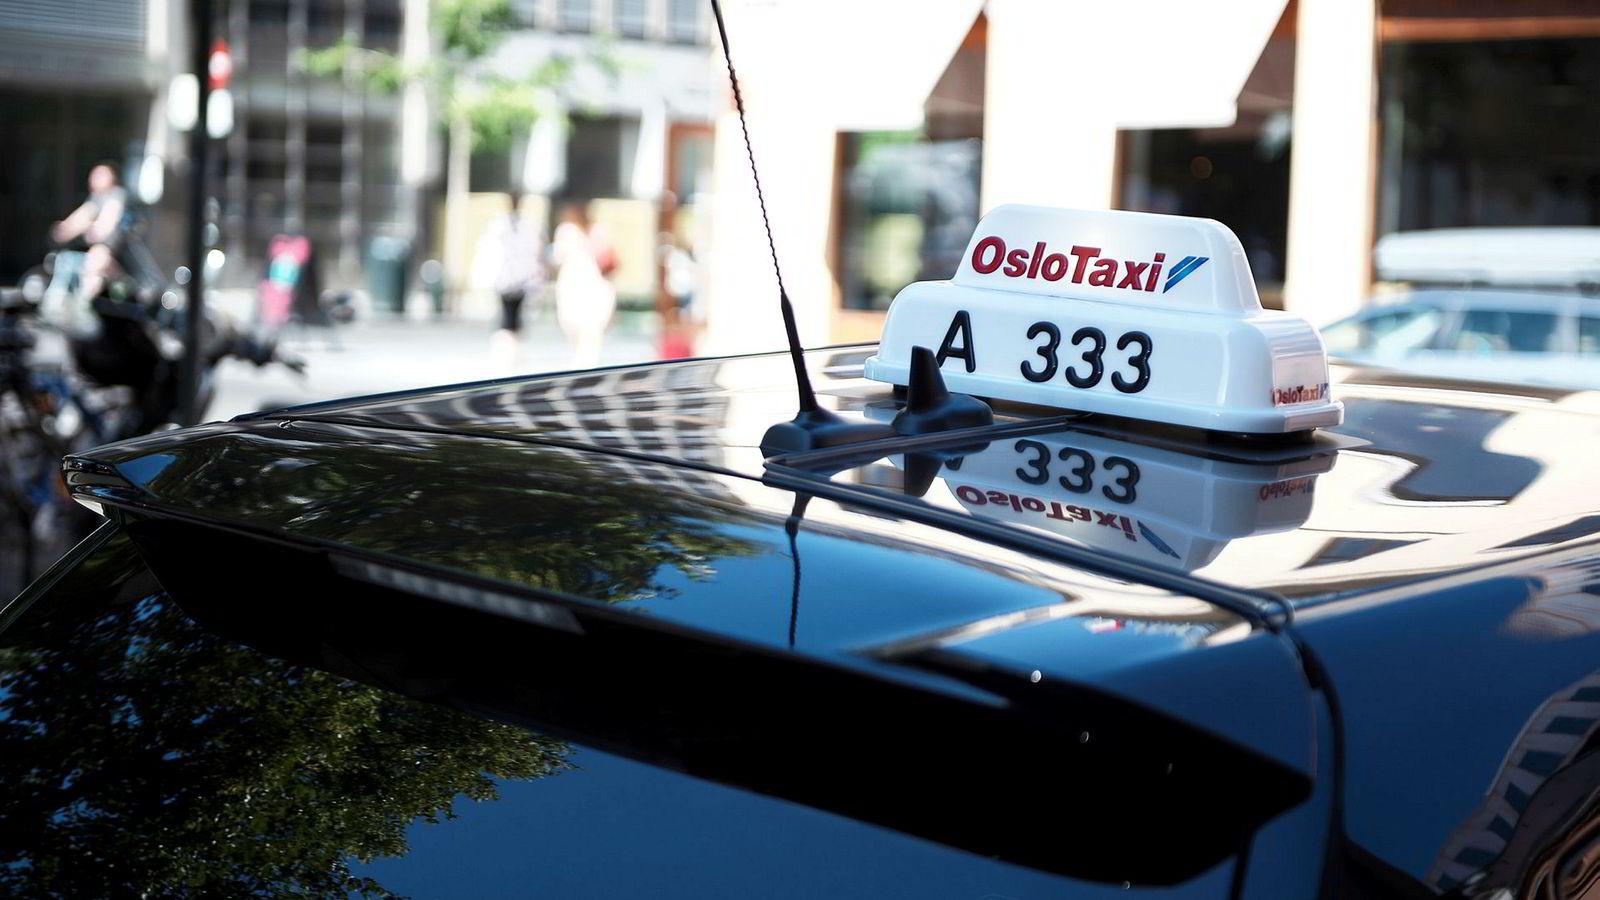 Sp og Taxiforbundet frykter at ny lov vil medføre at taxiyrket kan forsvinne.